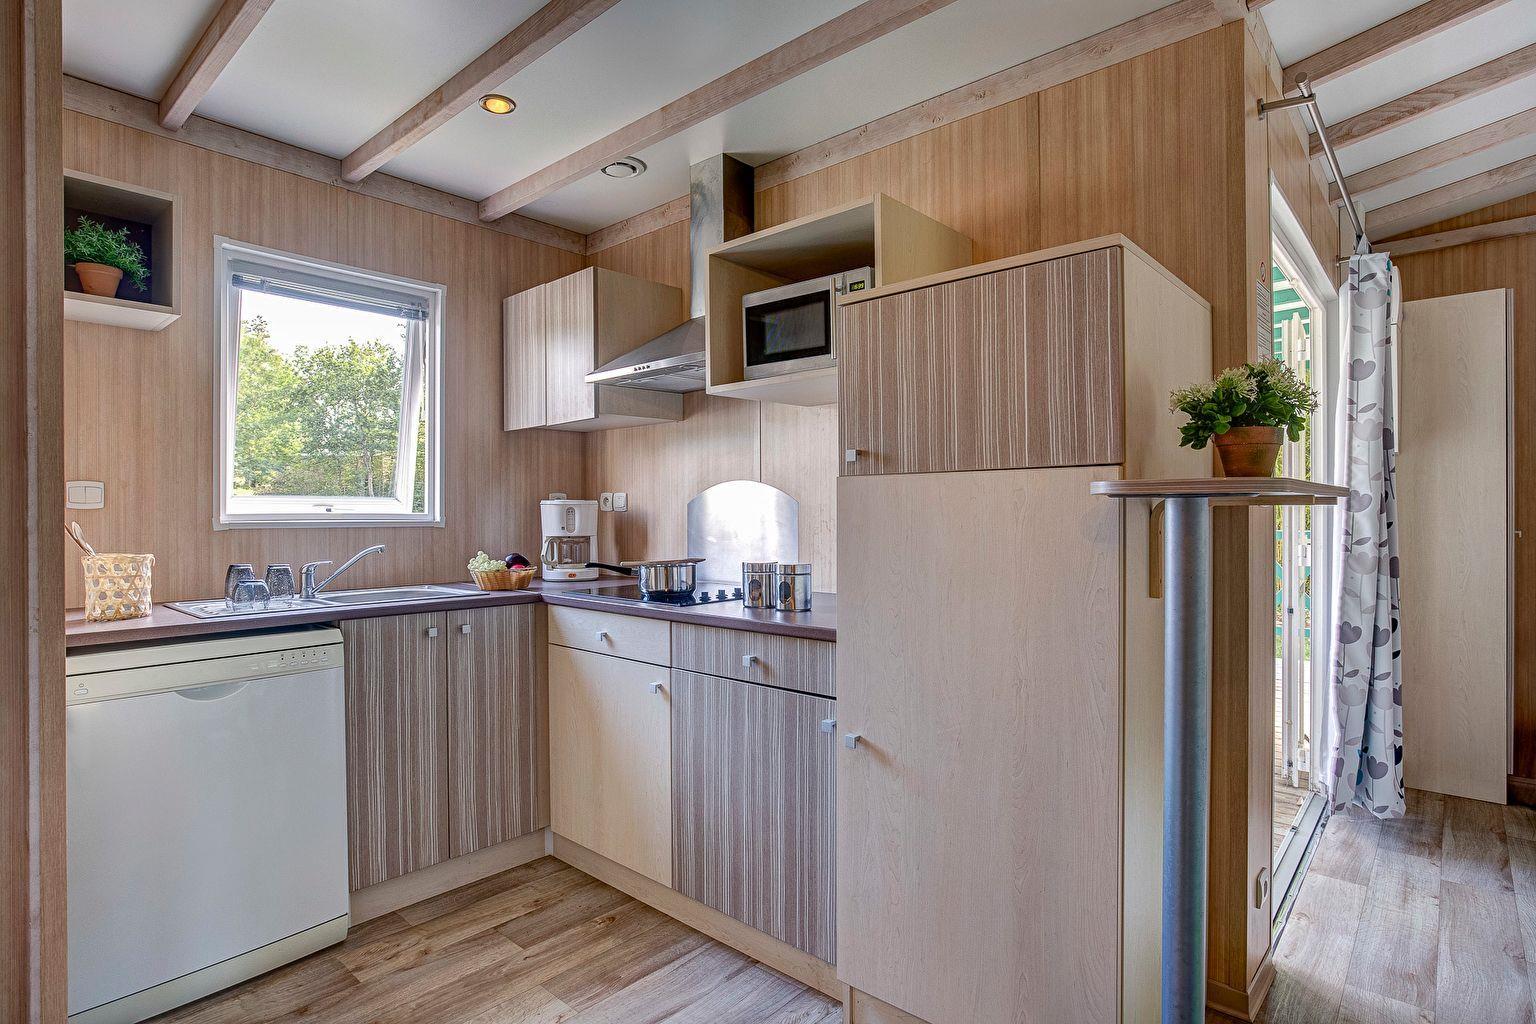 Location - Chalet 3 Chambres - 2 Salles De Bains - Climatisation *** - Camping Sandaya Les Alicourts Resort